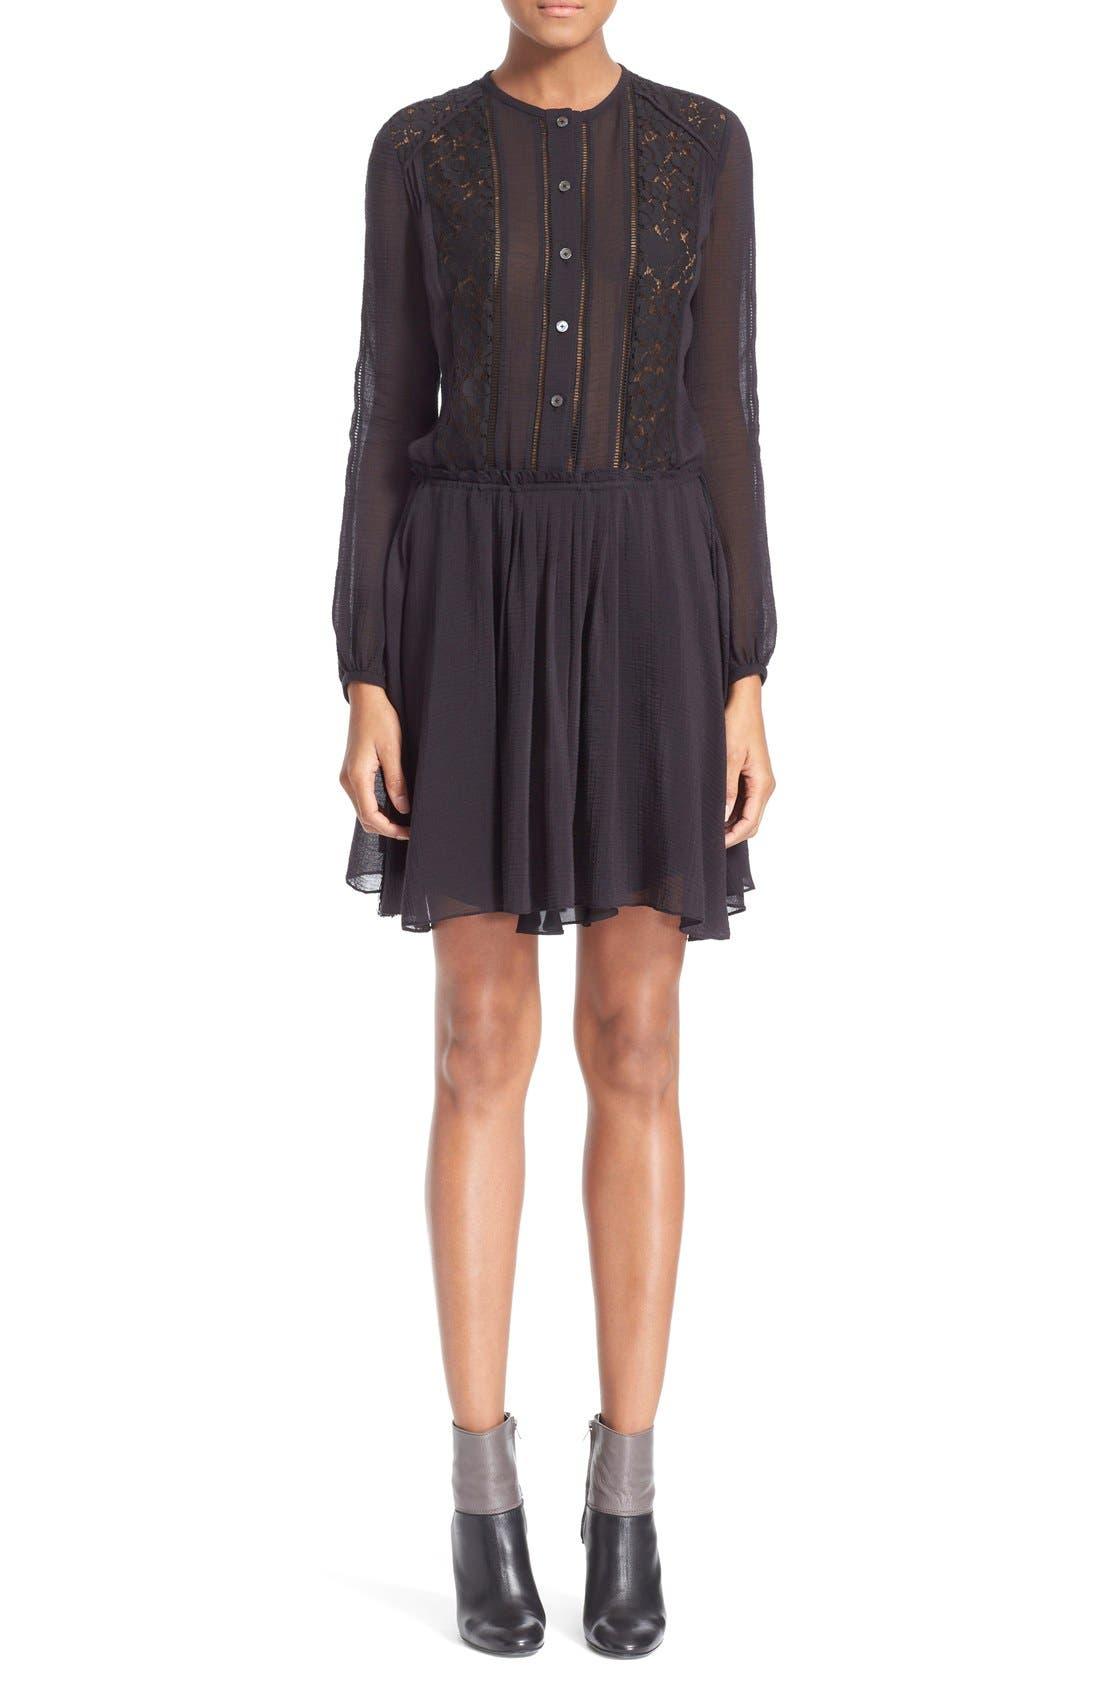 Main Image - Derek Lam 10 Crosby Lace Inset Dress